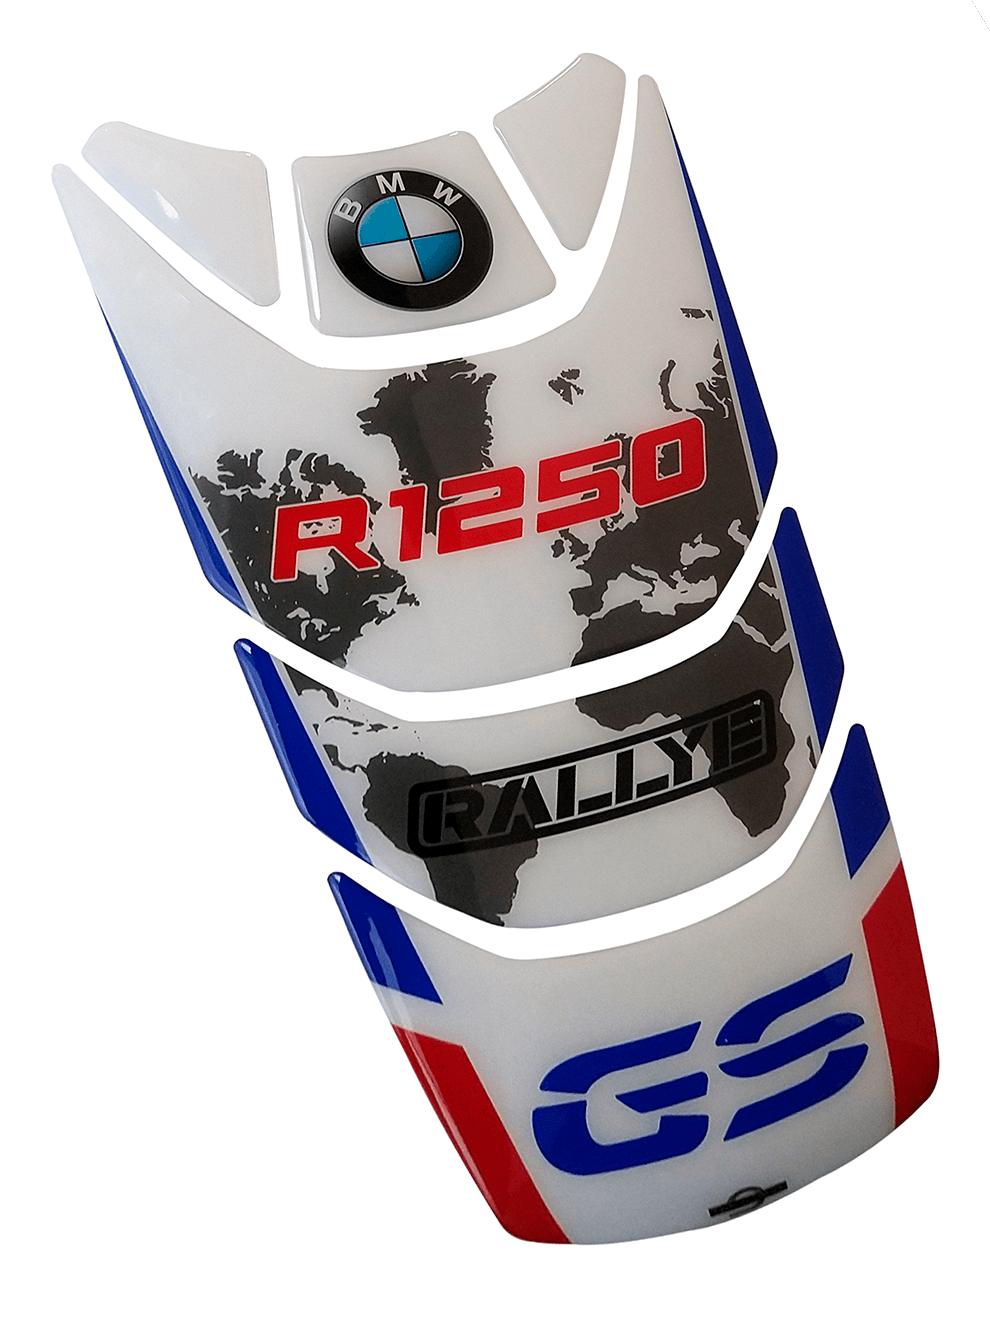 KIT Adesivos Protetor Tanque BMW R1250 GS Adventure Rallye Vermelho